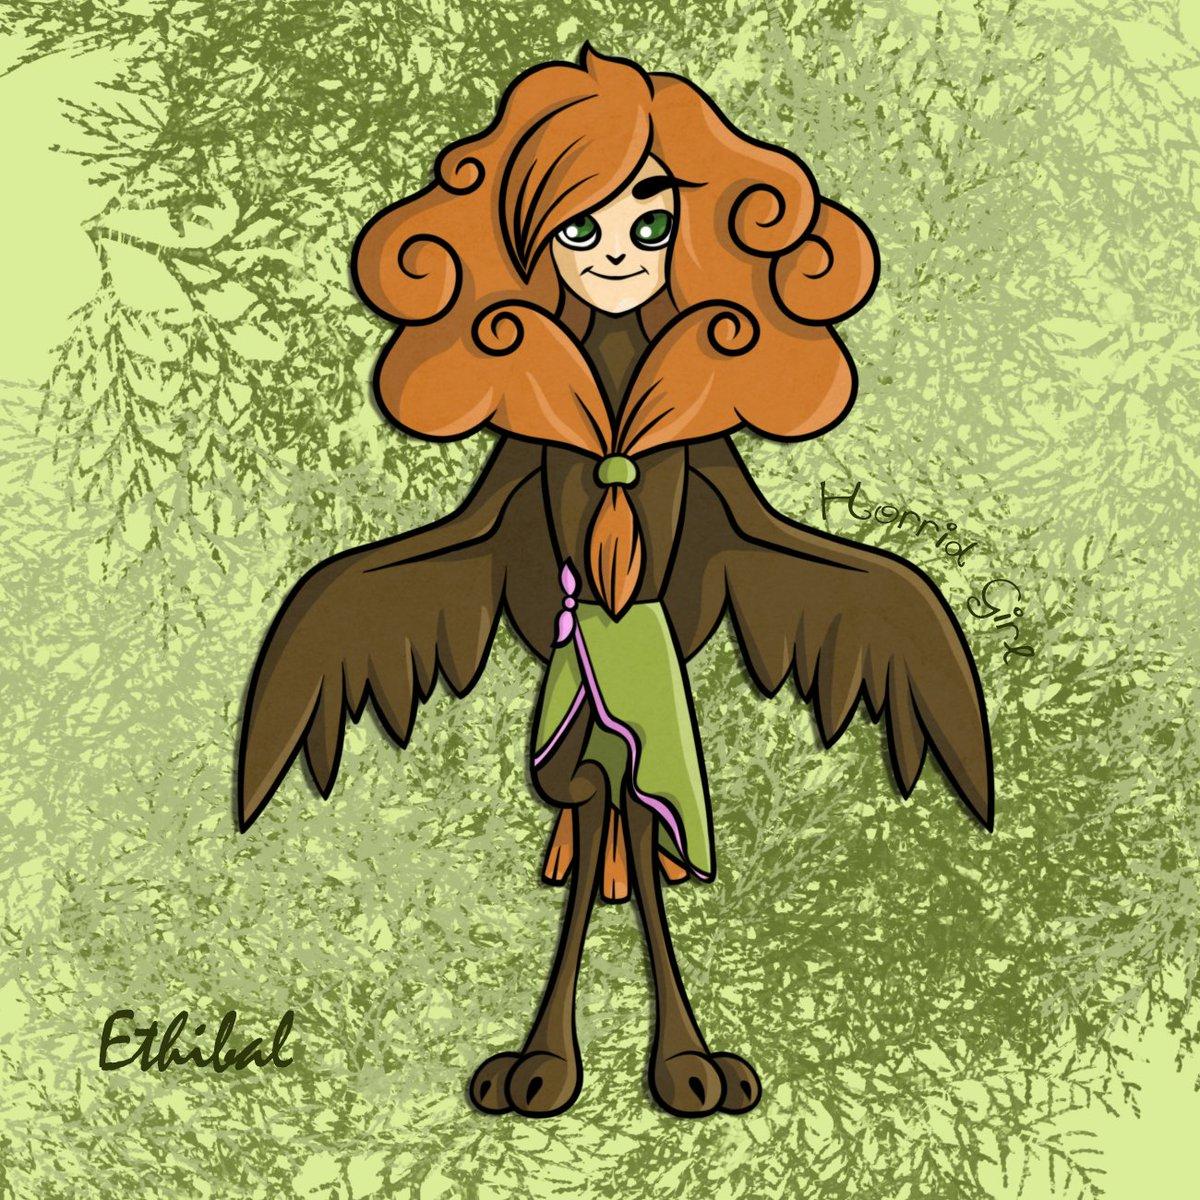 A character I made in school for concept art 😃 Ethibal, a young birdgirl, daughter of the dead King of the woods #bird #birdperson #cute #king #princess #birdprincess #conceptart #art #digitalart #hawk #sky #magic